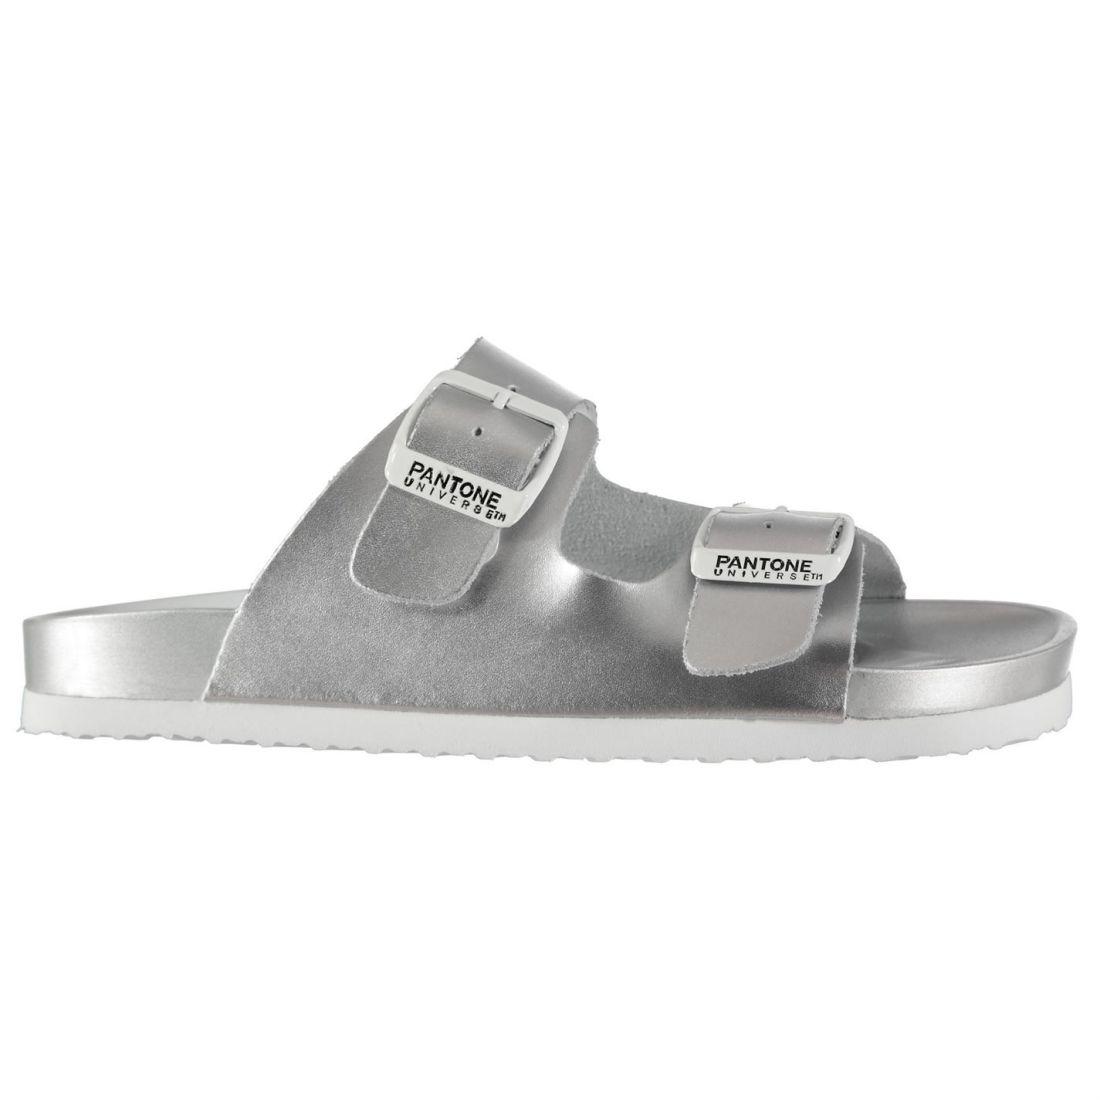 Pantone Womens Formentera Sliders Flat Sandals Buckle Fastening Strap ddba16462